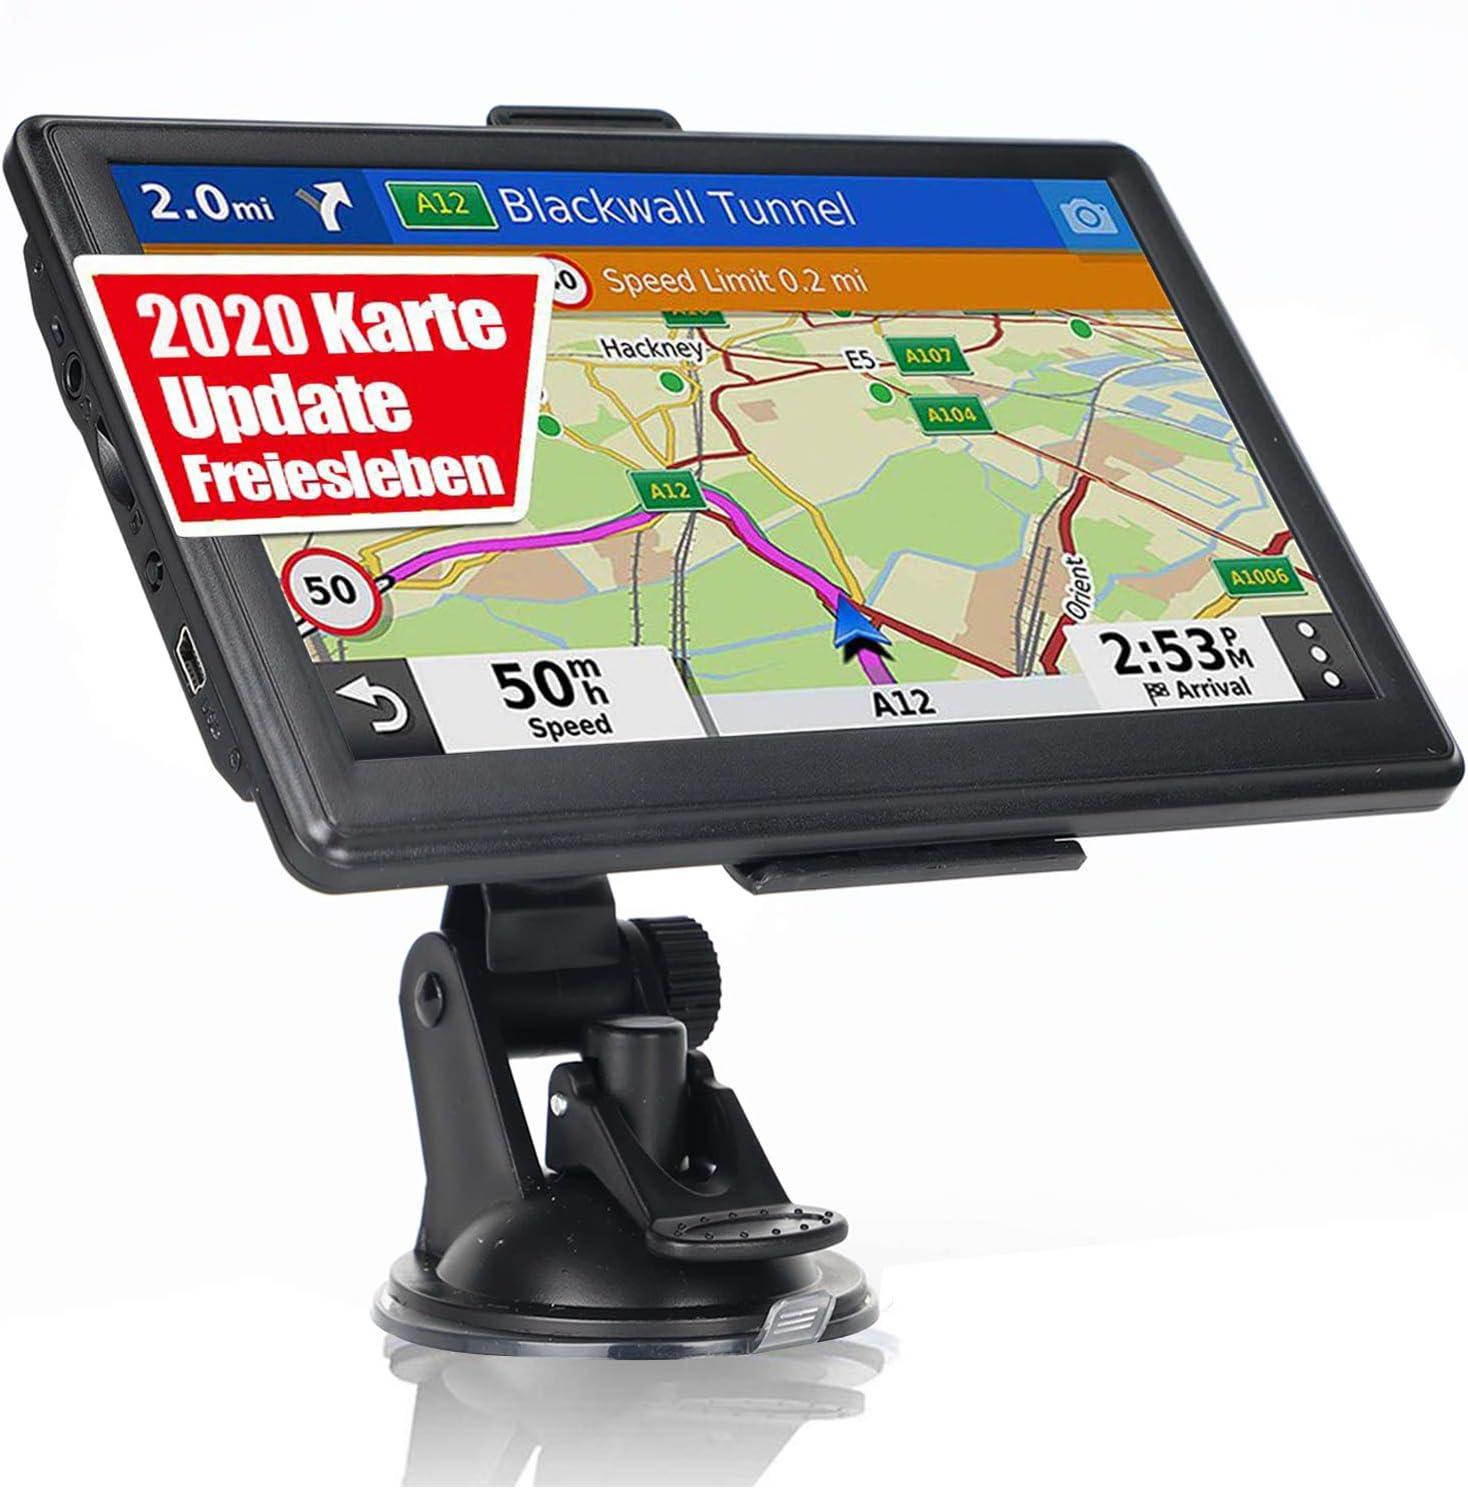 Gratis de Pop de actualizaci/ón Disponible e coche soporte de tarjeta camper bicicleta 46 Europa pa/íses de Europa con Russia y turquesa autob/ús 10,92 cm GPS navegador GPS incluye parasol para cami/ón o en modo peatonal...